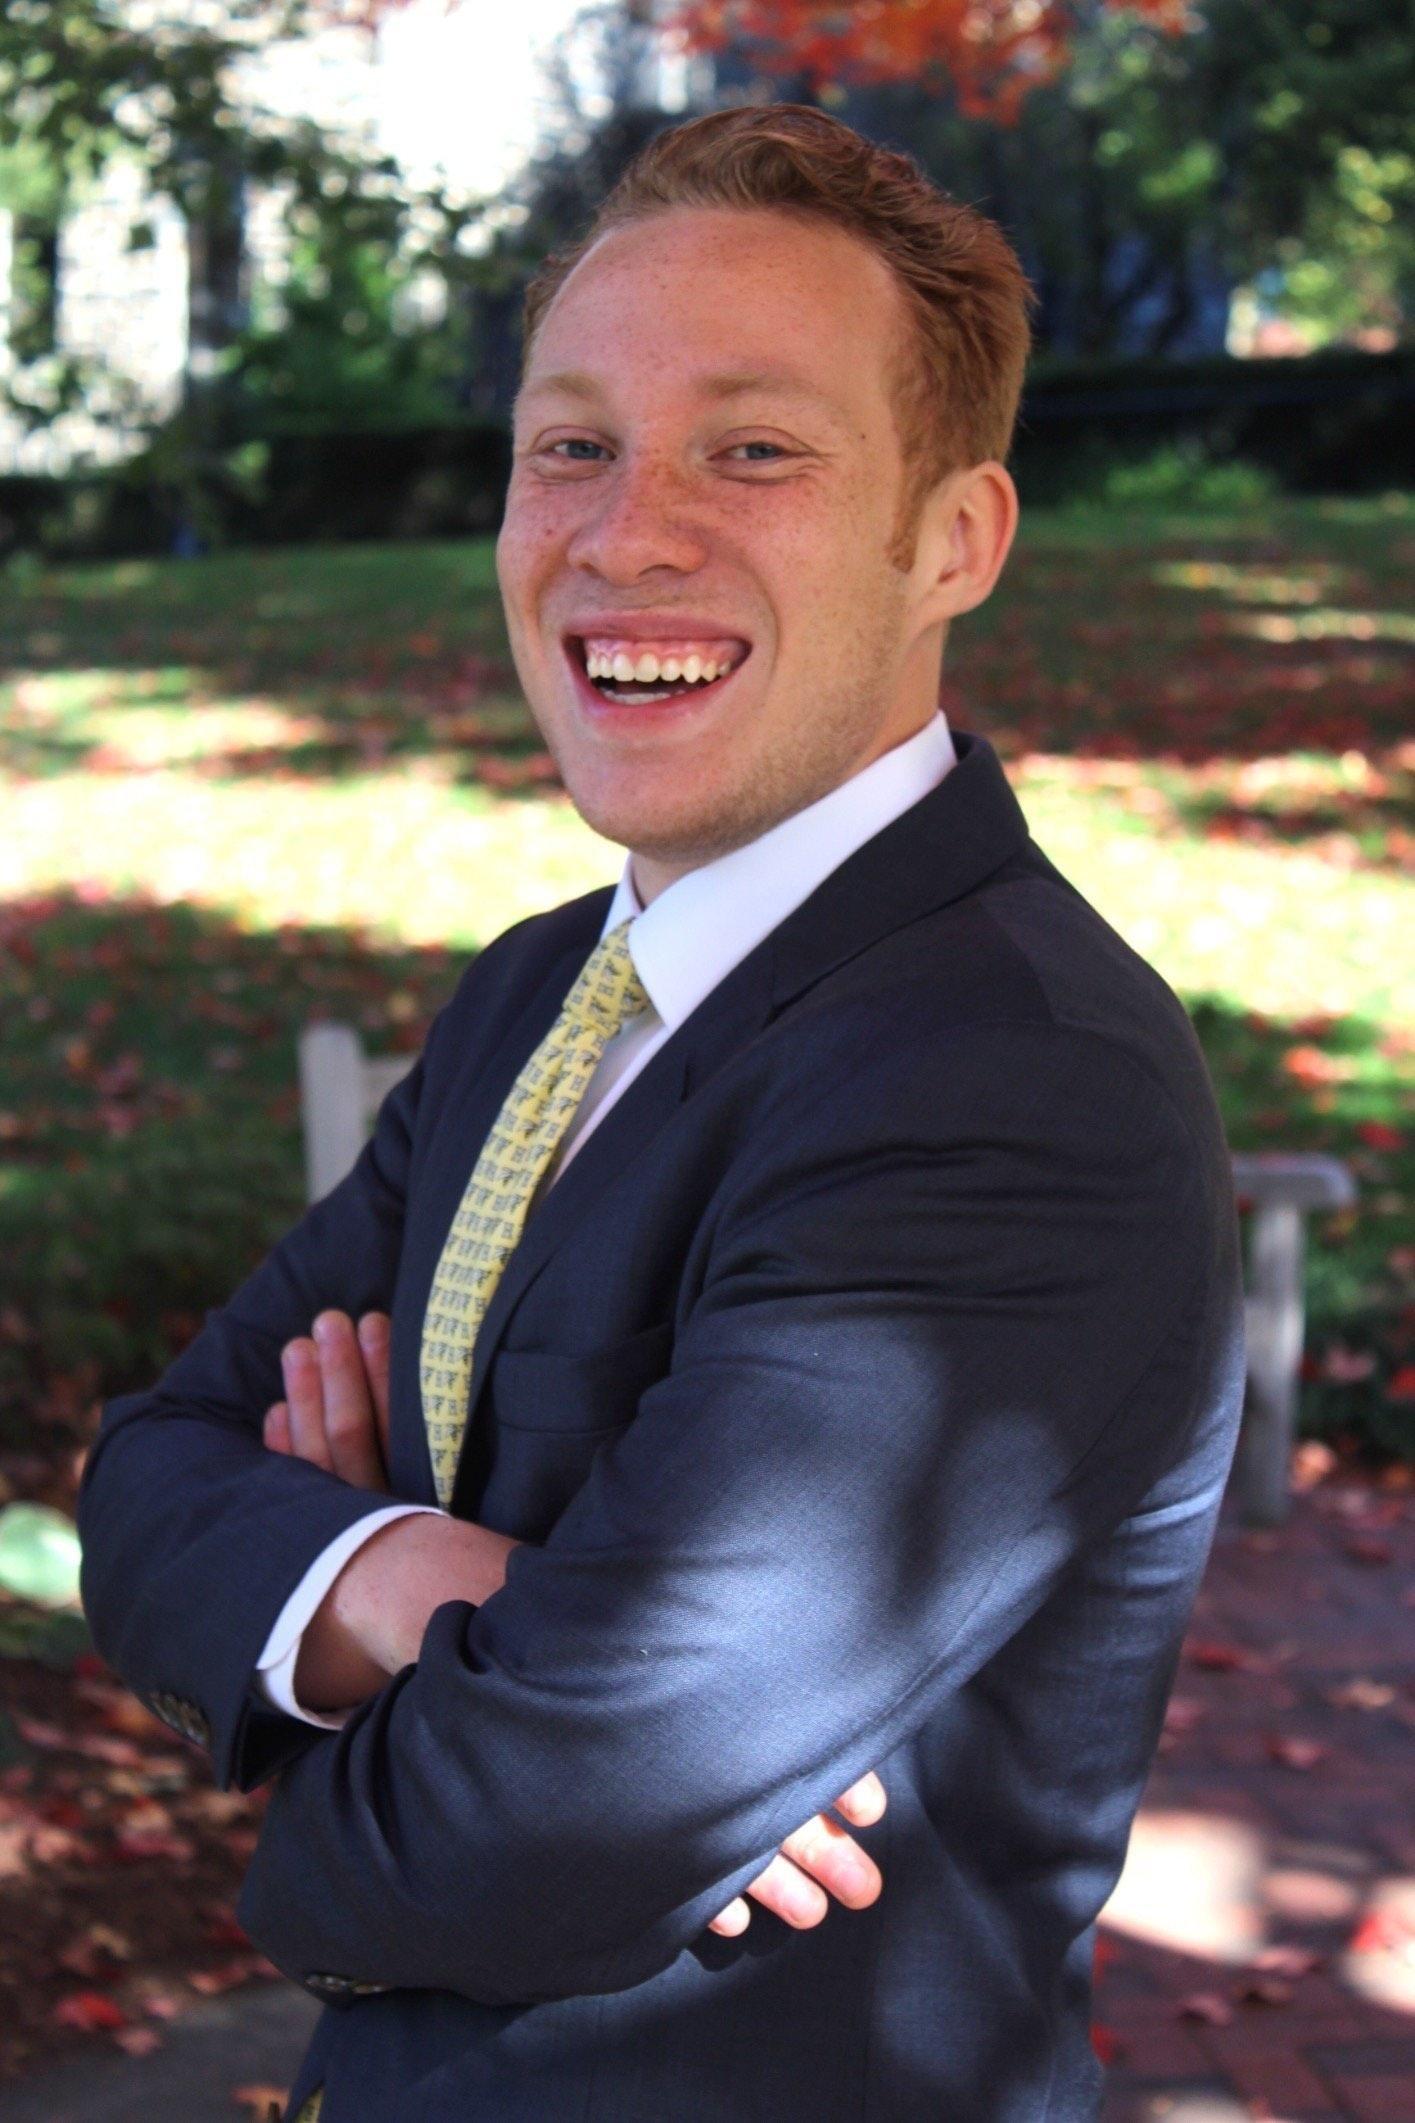 Joshua Terry